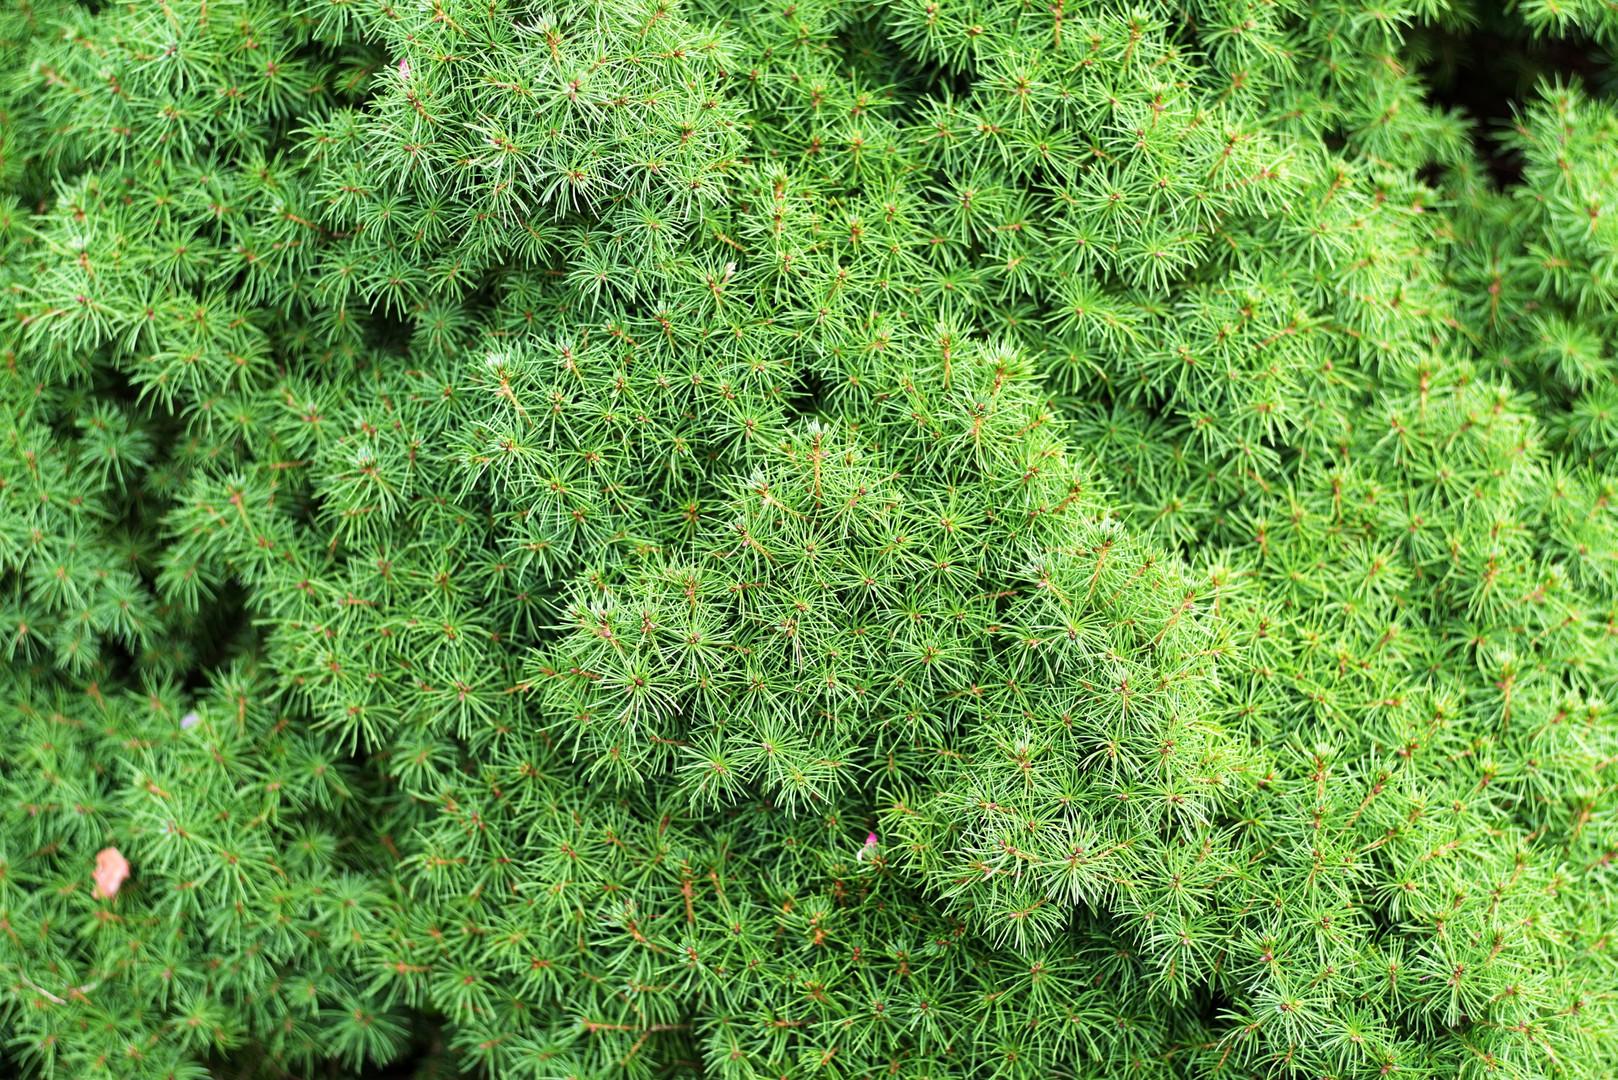 plants046.jpg